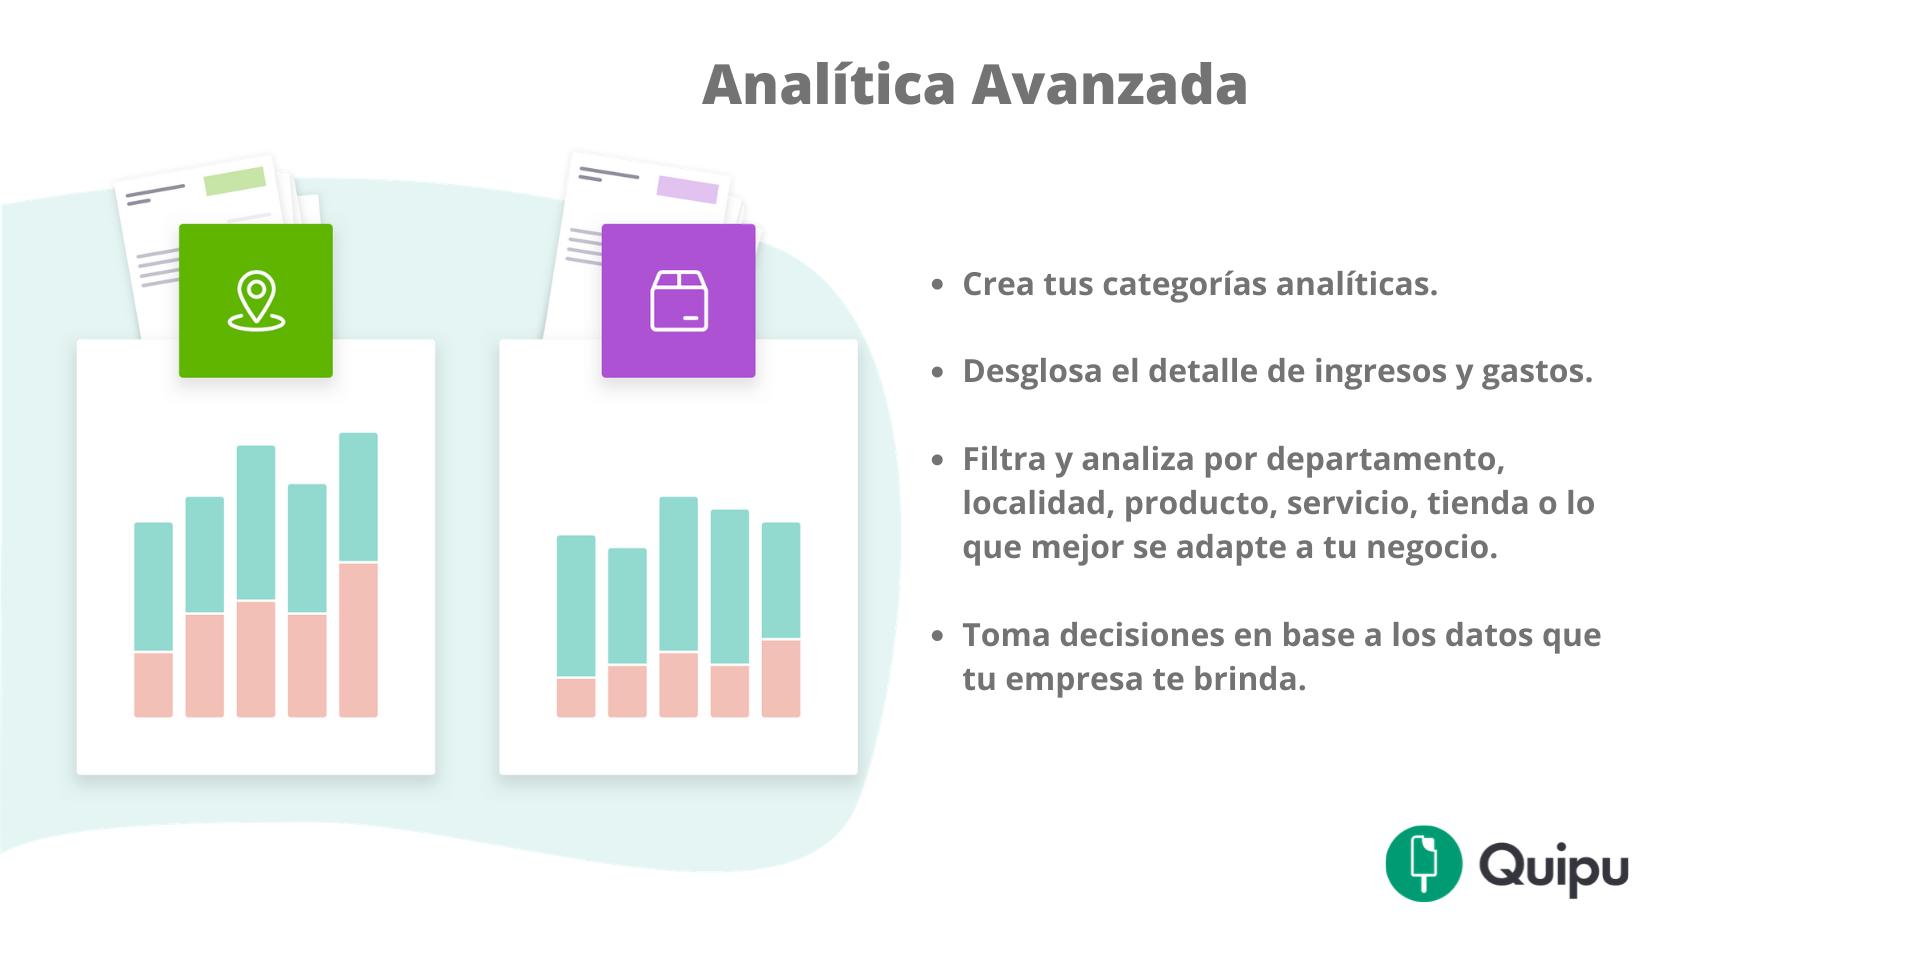 analitica avanzada empresa